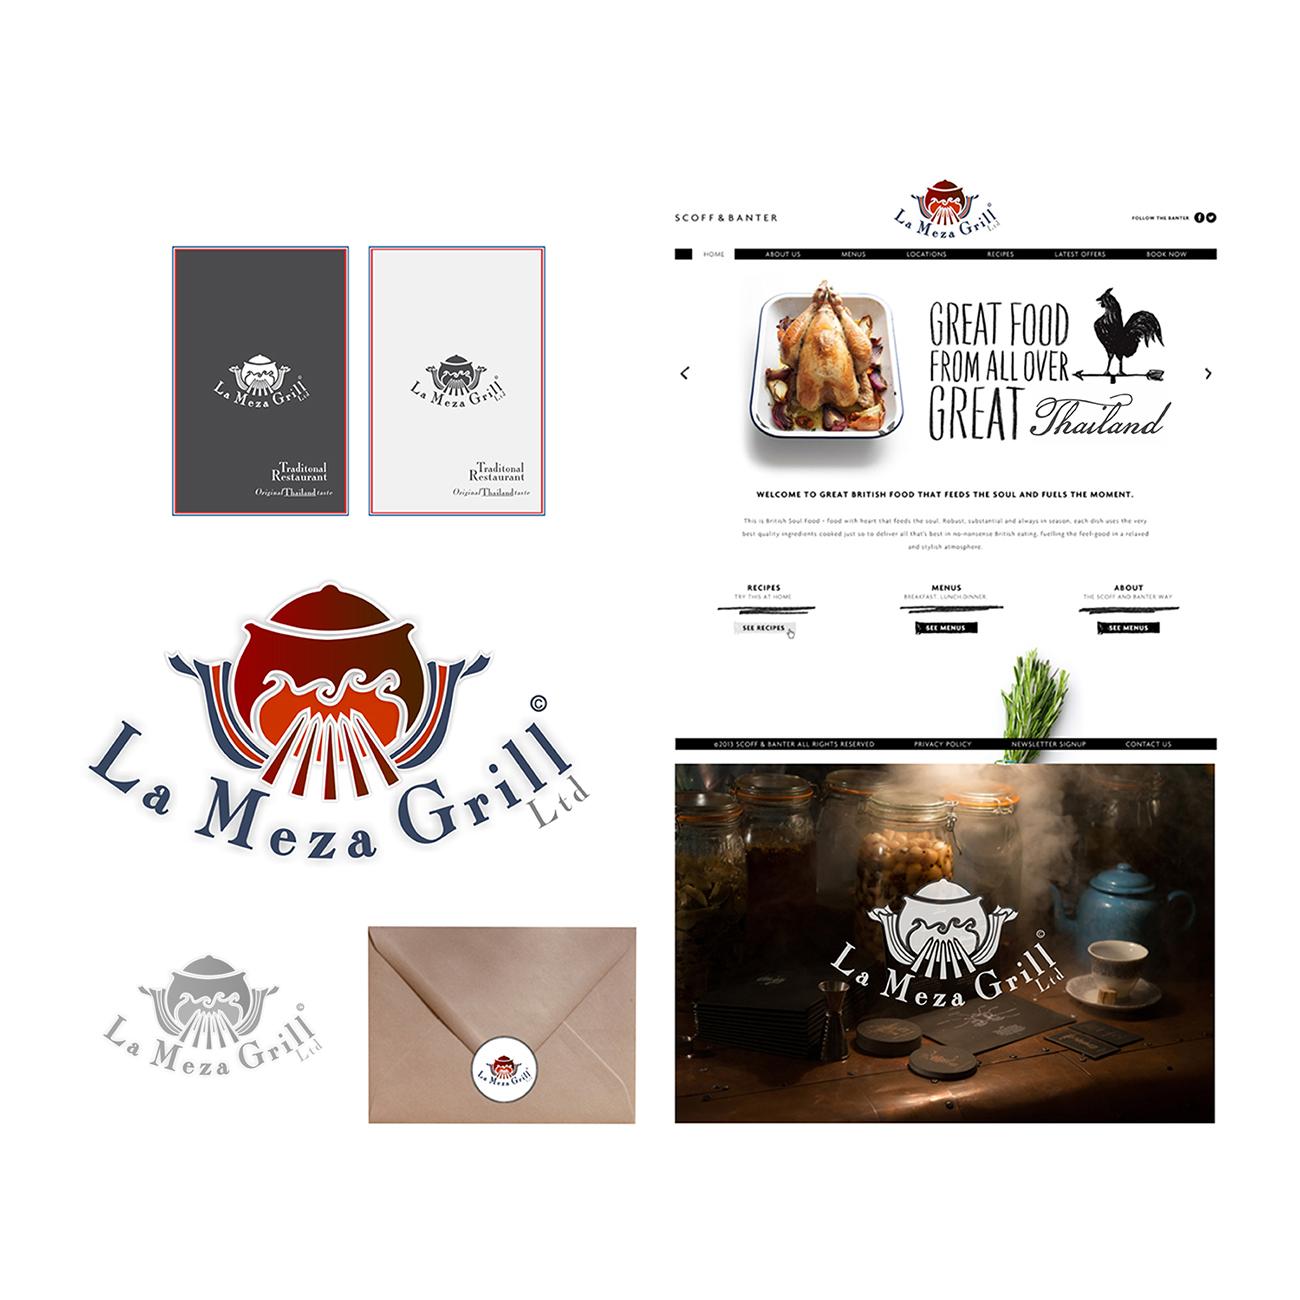 Logo Design by Think - Entry No. 92 in the Logo Design Contest Inspiring Logo Design for La Meza Grill Ltd..